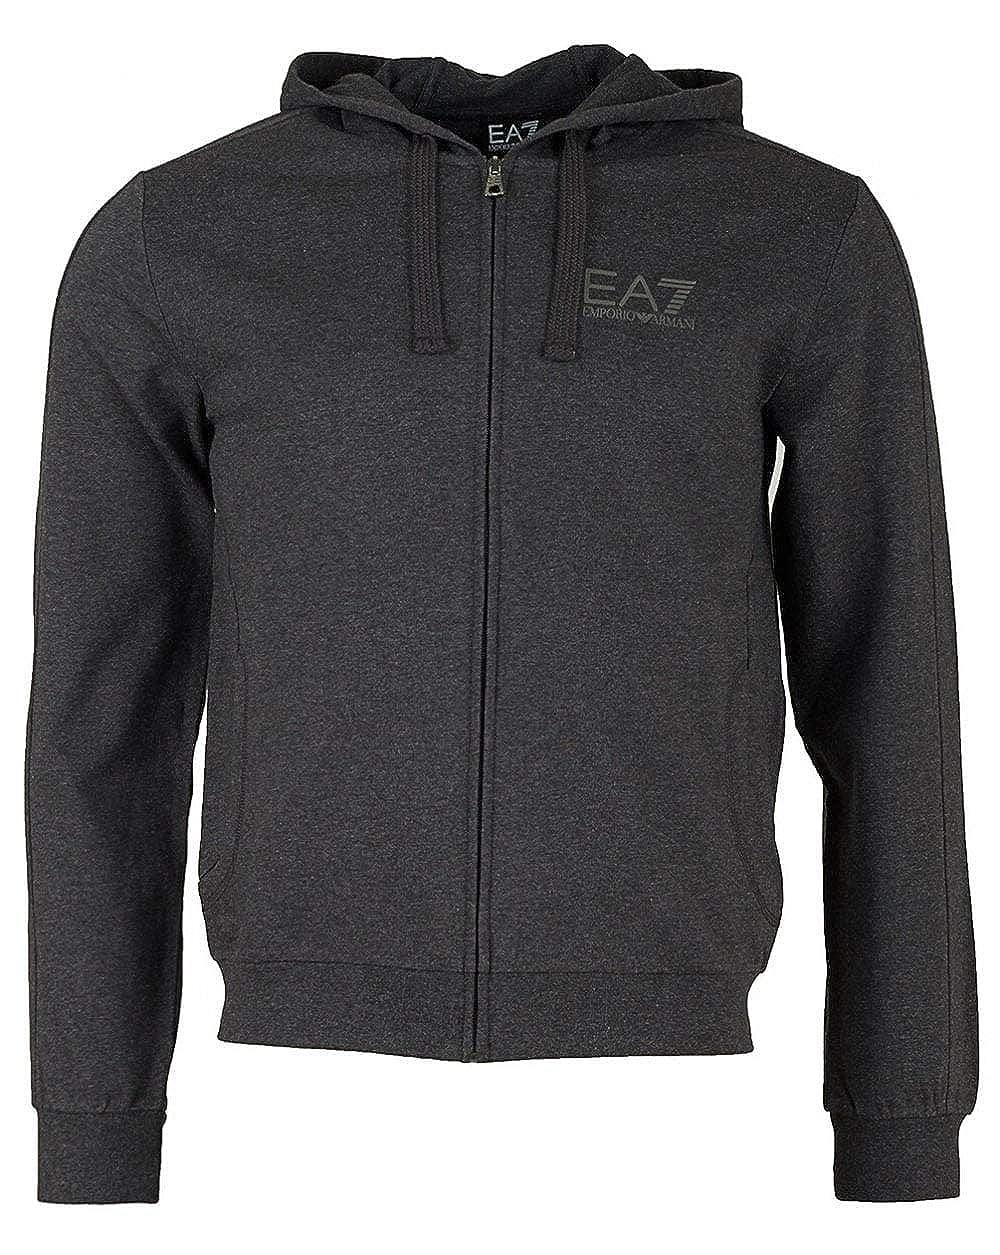 Ea7 Train Core Id Cotton Hooded Sweat